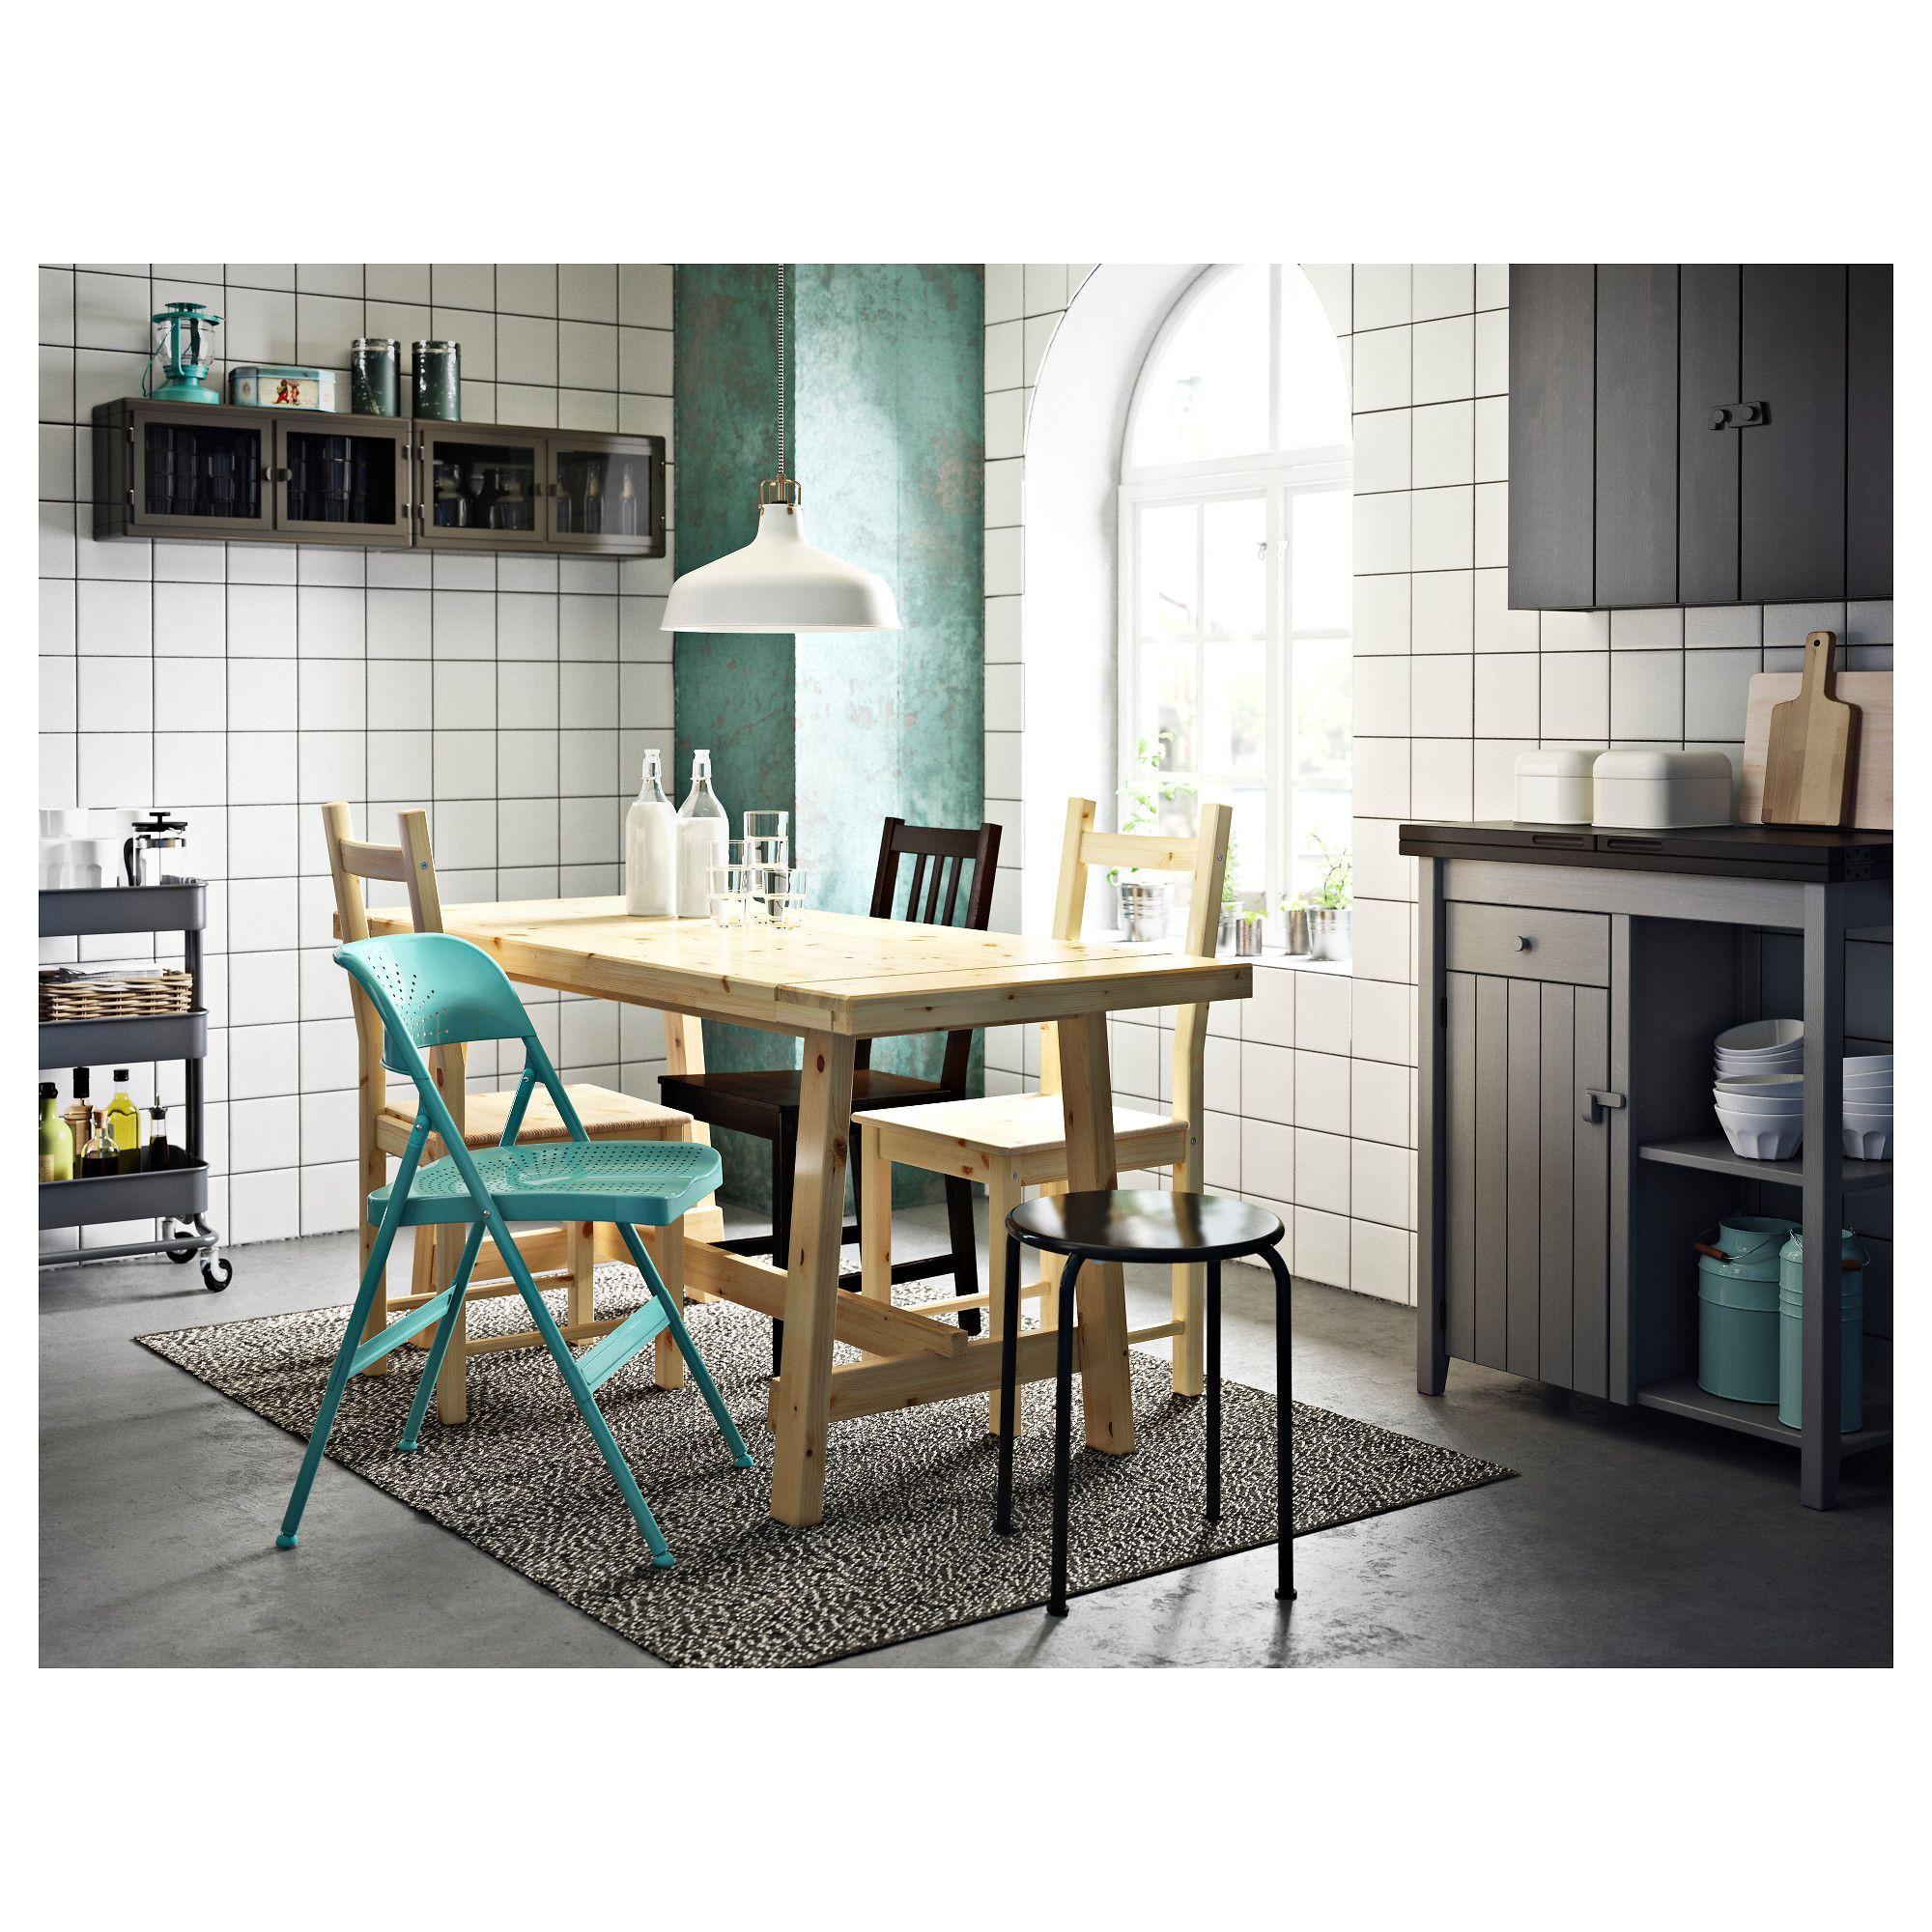 Dining Room Lighting Ikea: IKEA - RANARP Pendant Lamp Off-white In 2019